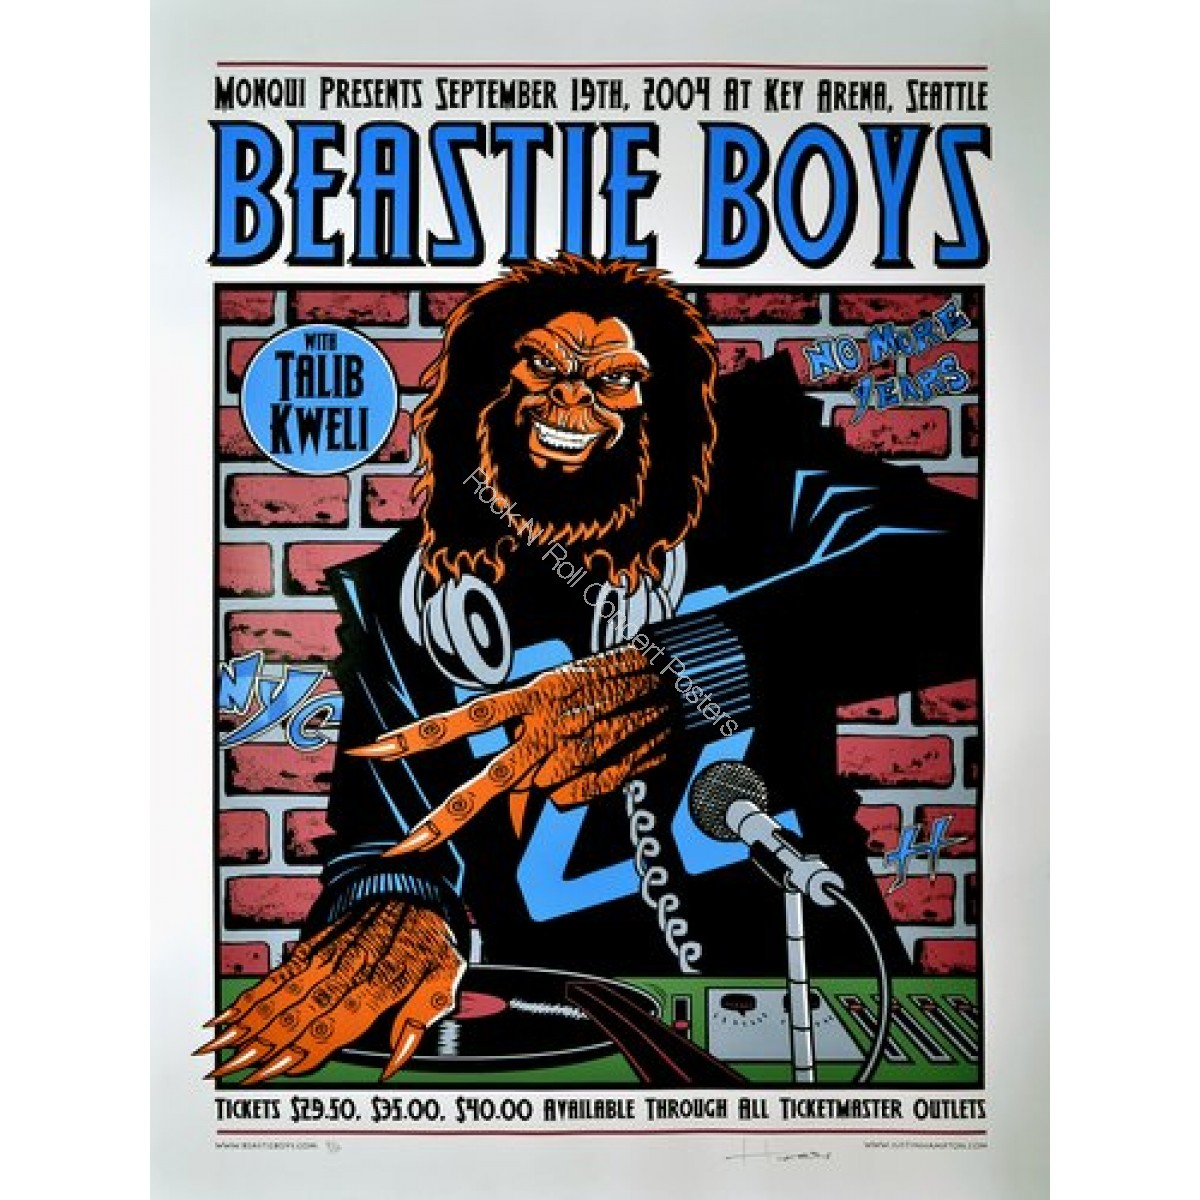 Beastie Boys @ Key Arena Seattle 9/19/04 By Justin Hampton